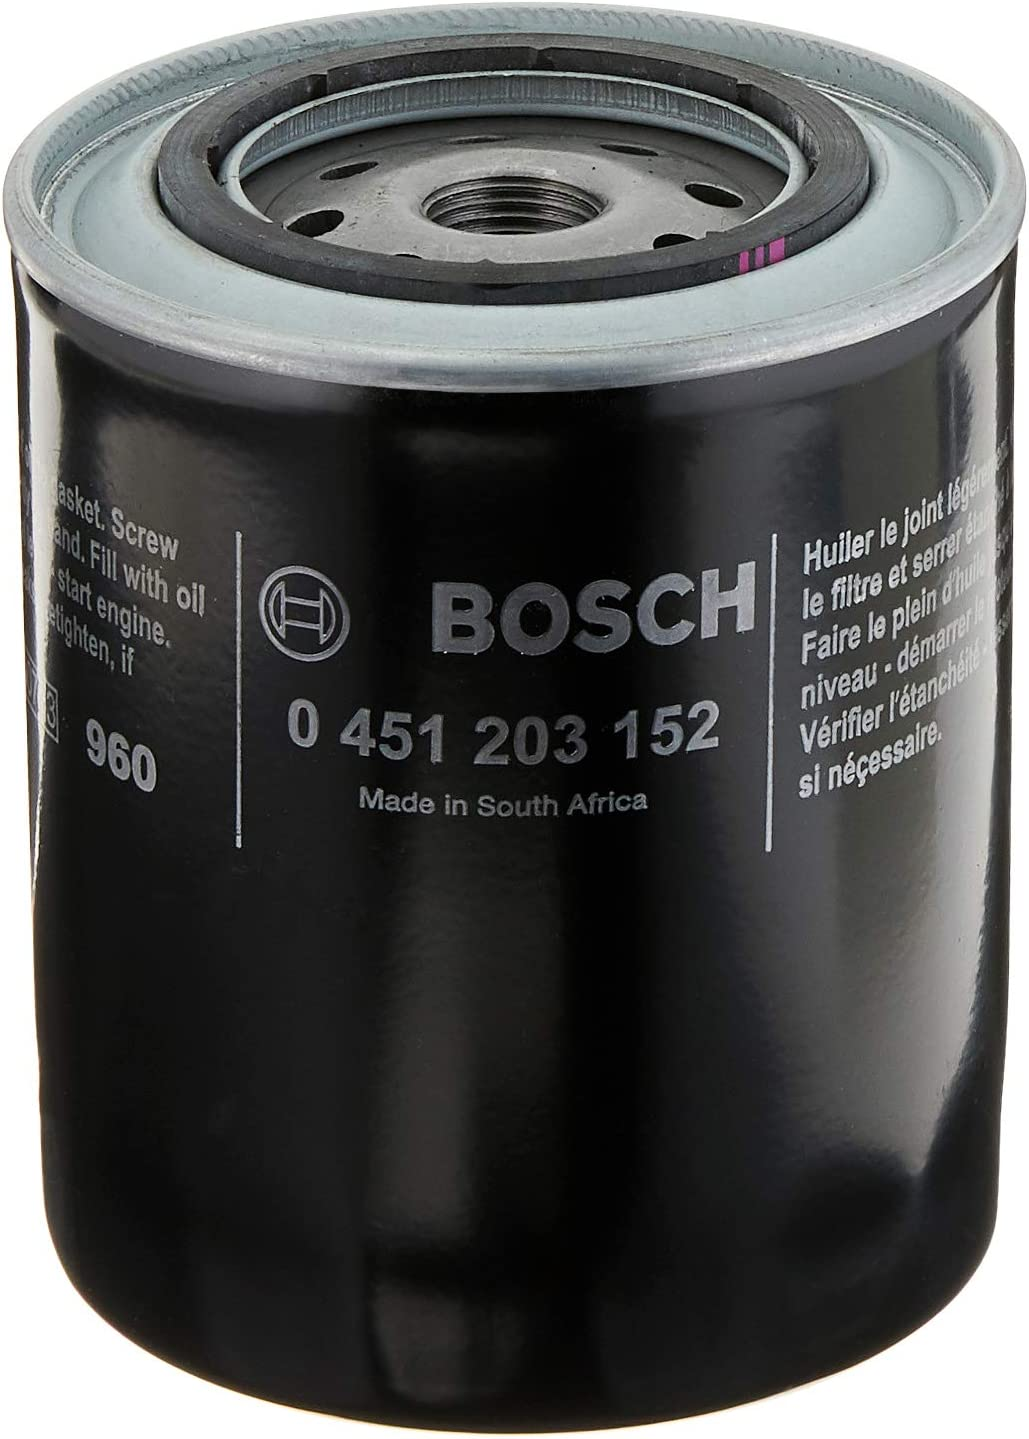 Bosch 451203152 Filter Auto